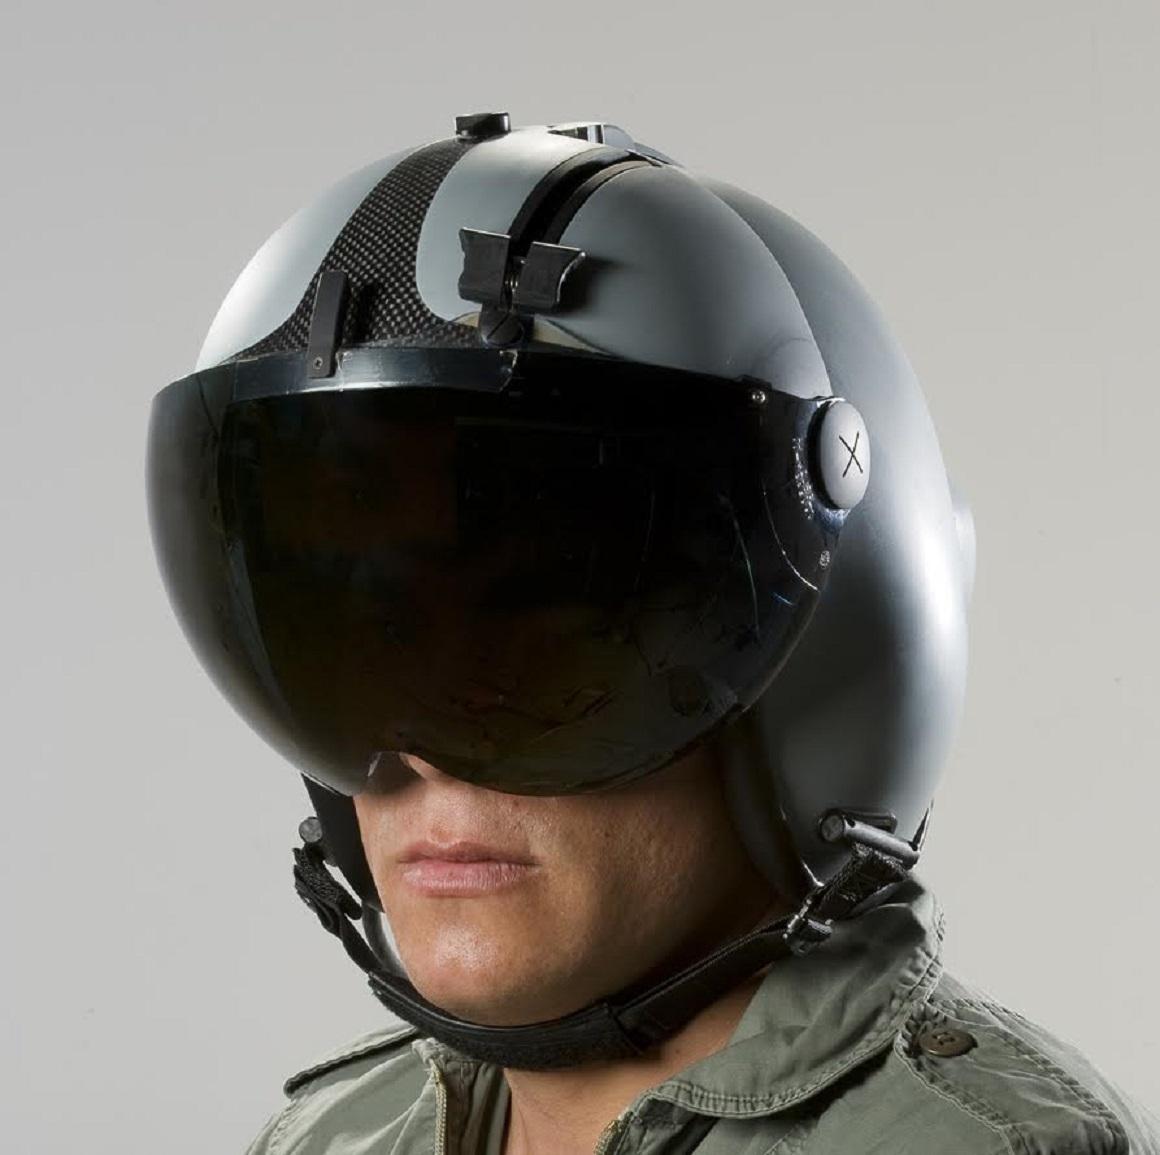 New Vr Combat Helmet Also For Drone Pilots Ihls